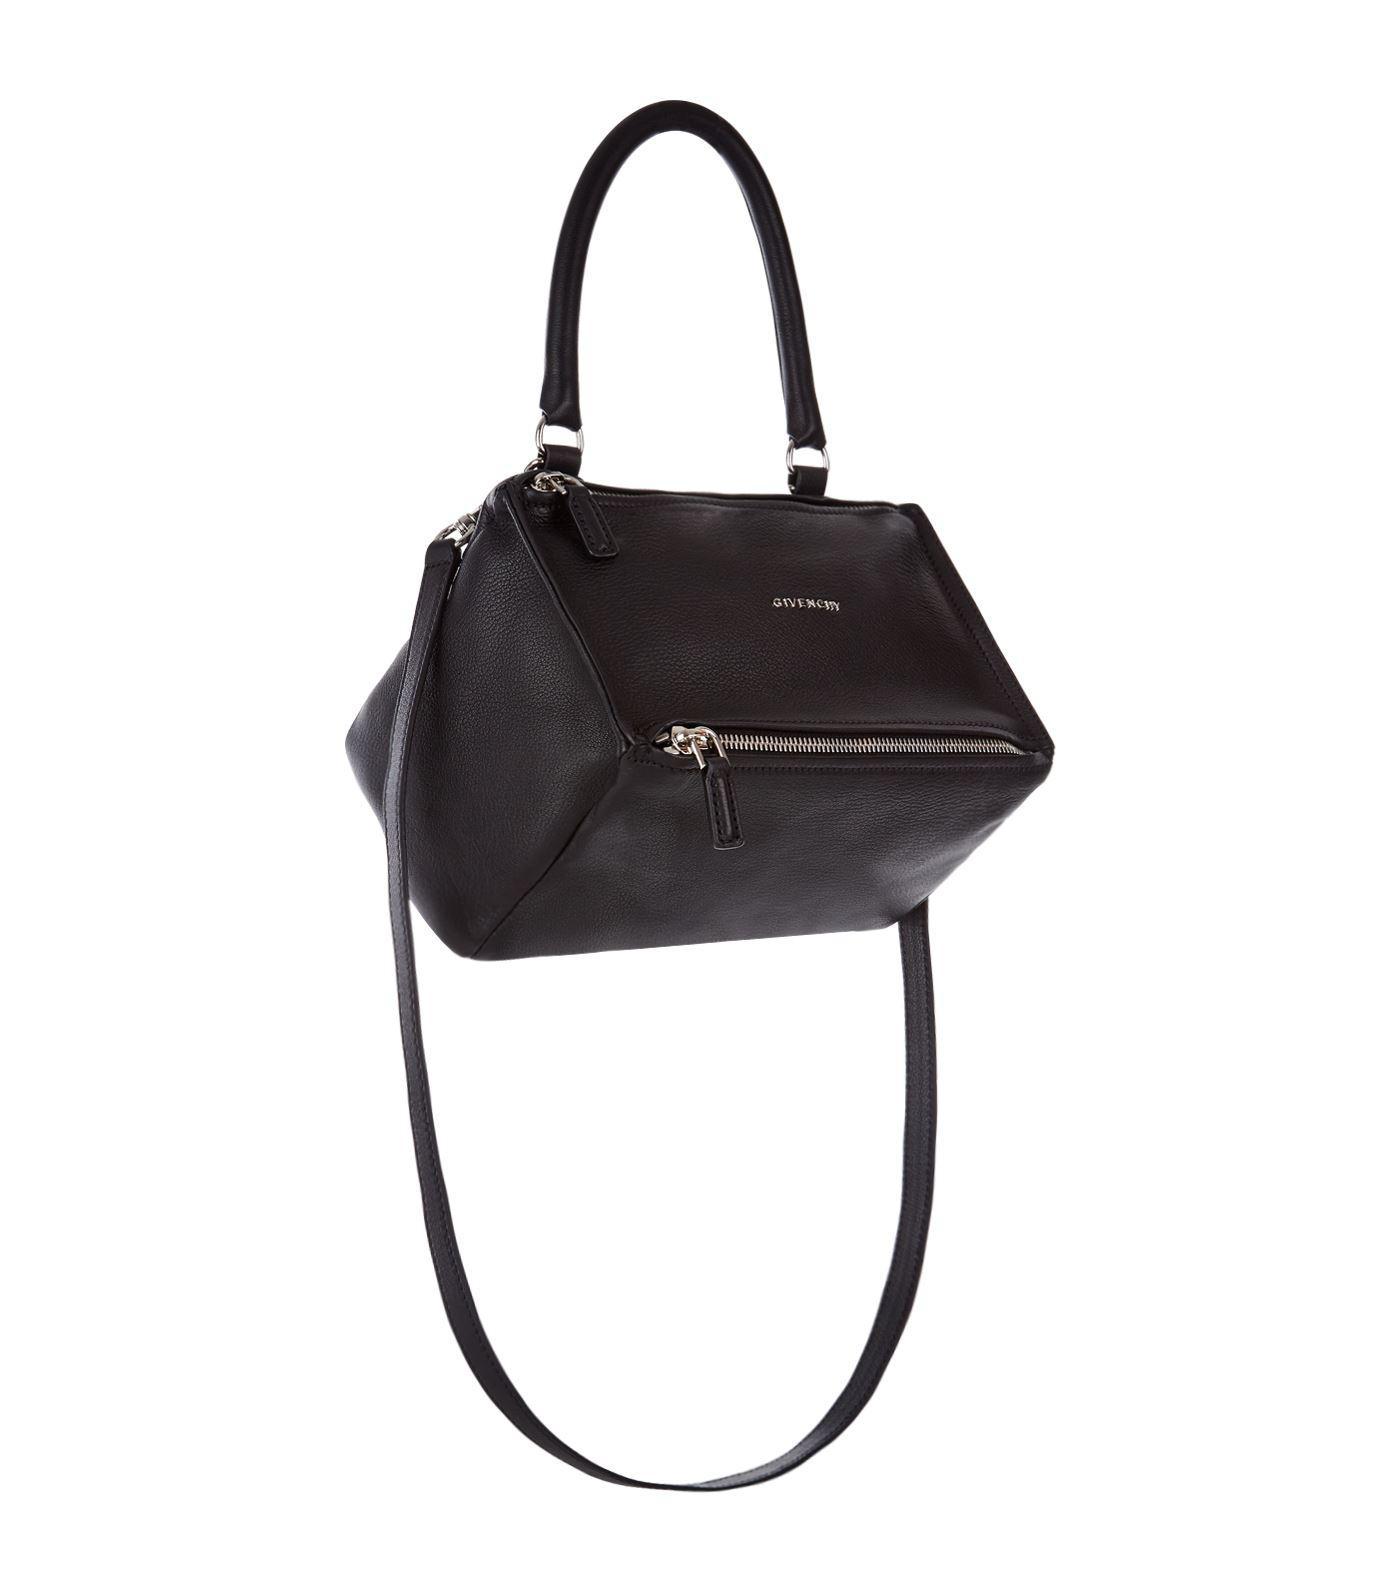 2486d3d80e Lyst - Givenchy Small Pandora Shoulder Bag in Black - Save ...